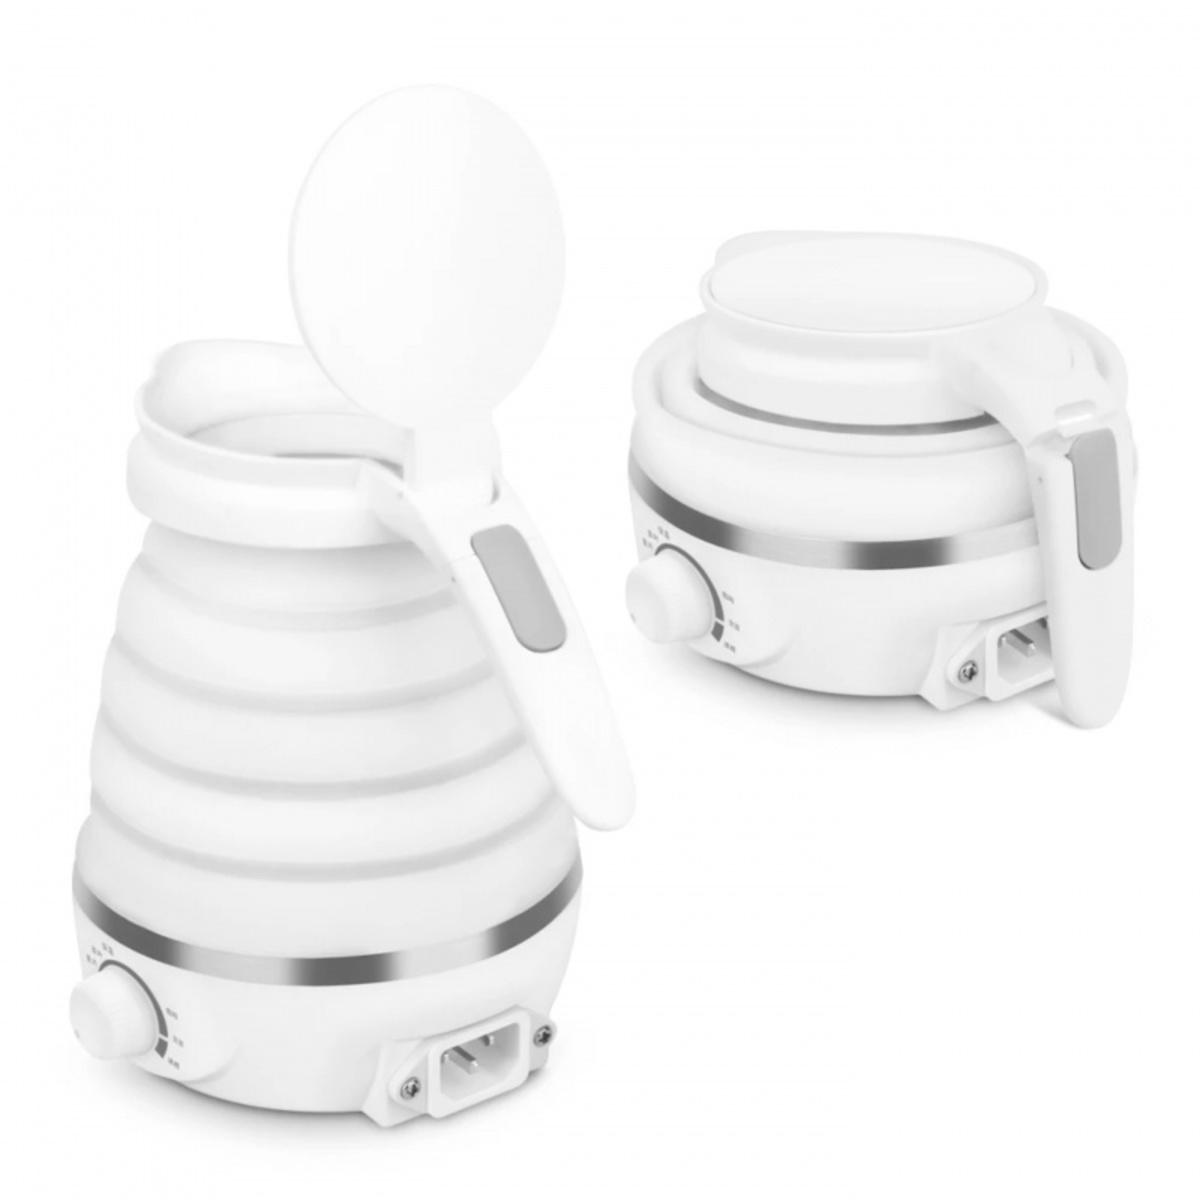 Travel folding electric kettle White